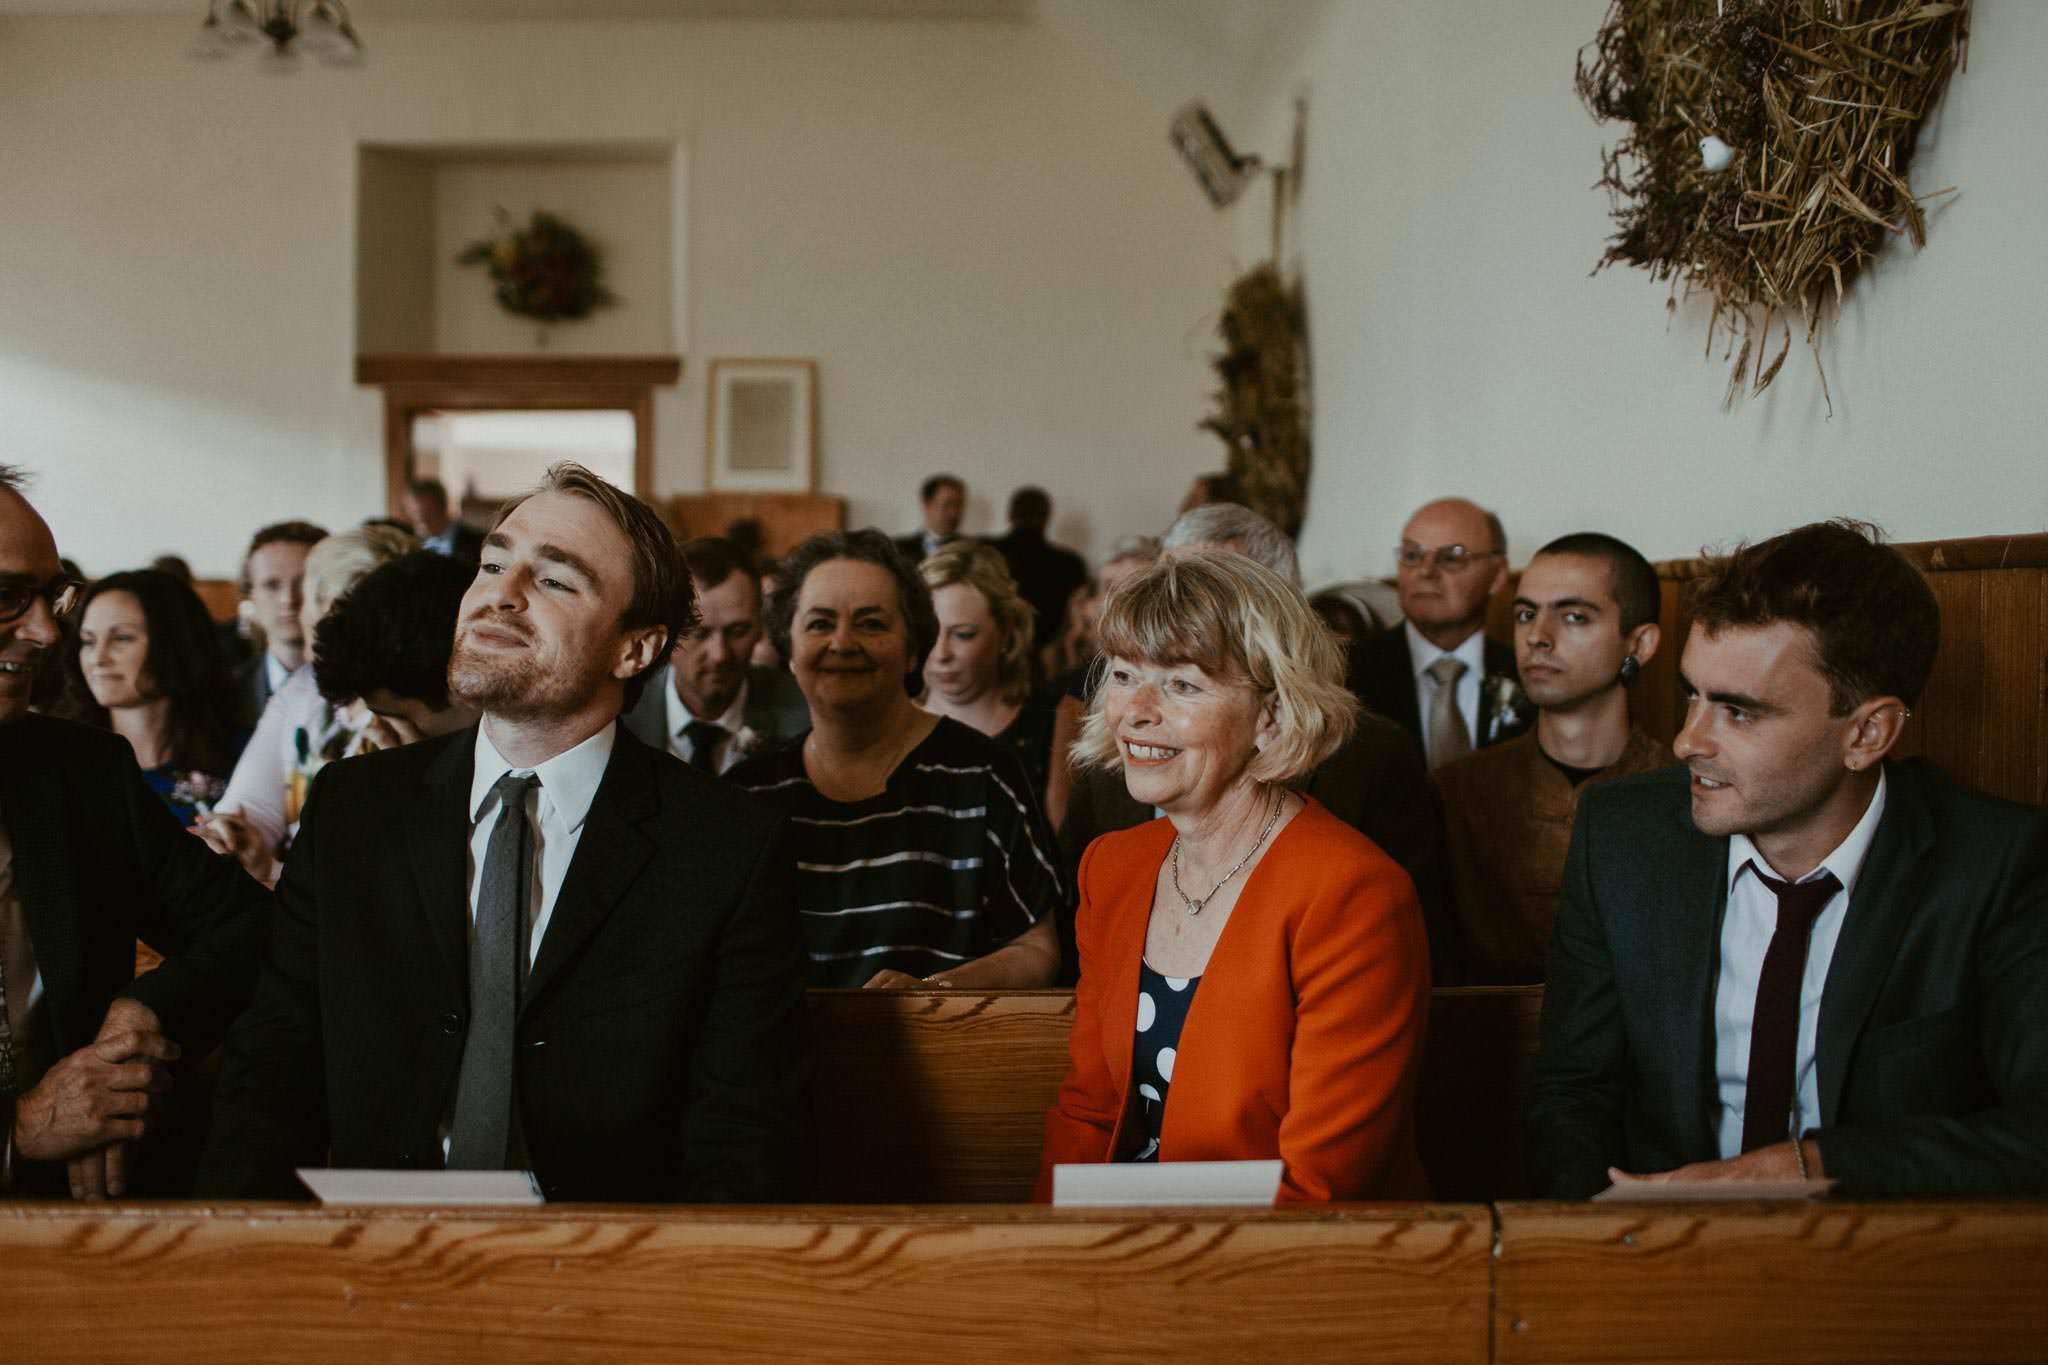 scotland-wedding-photographer-050